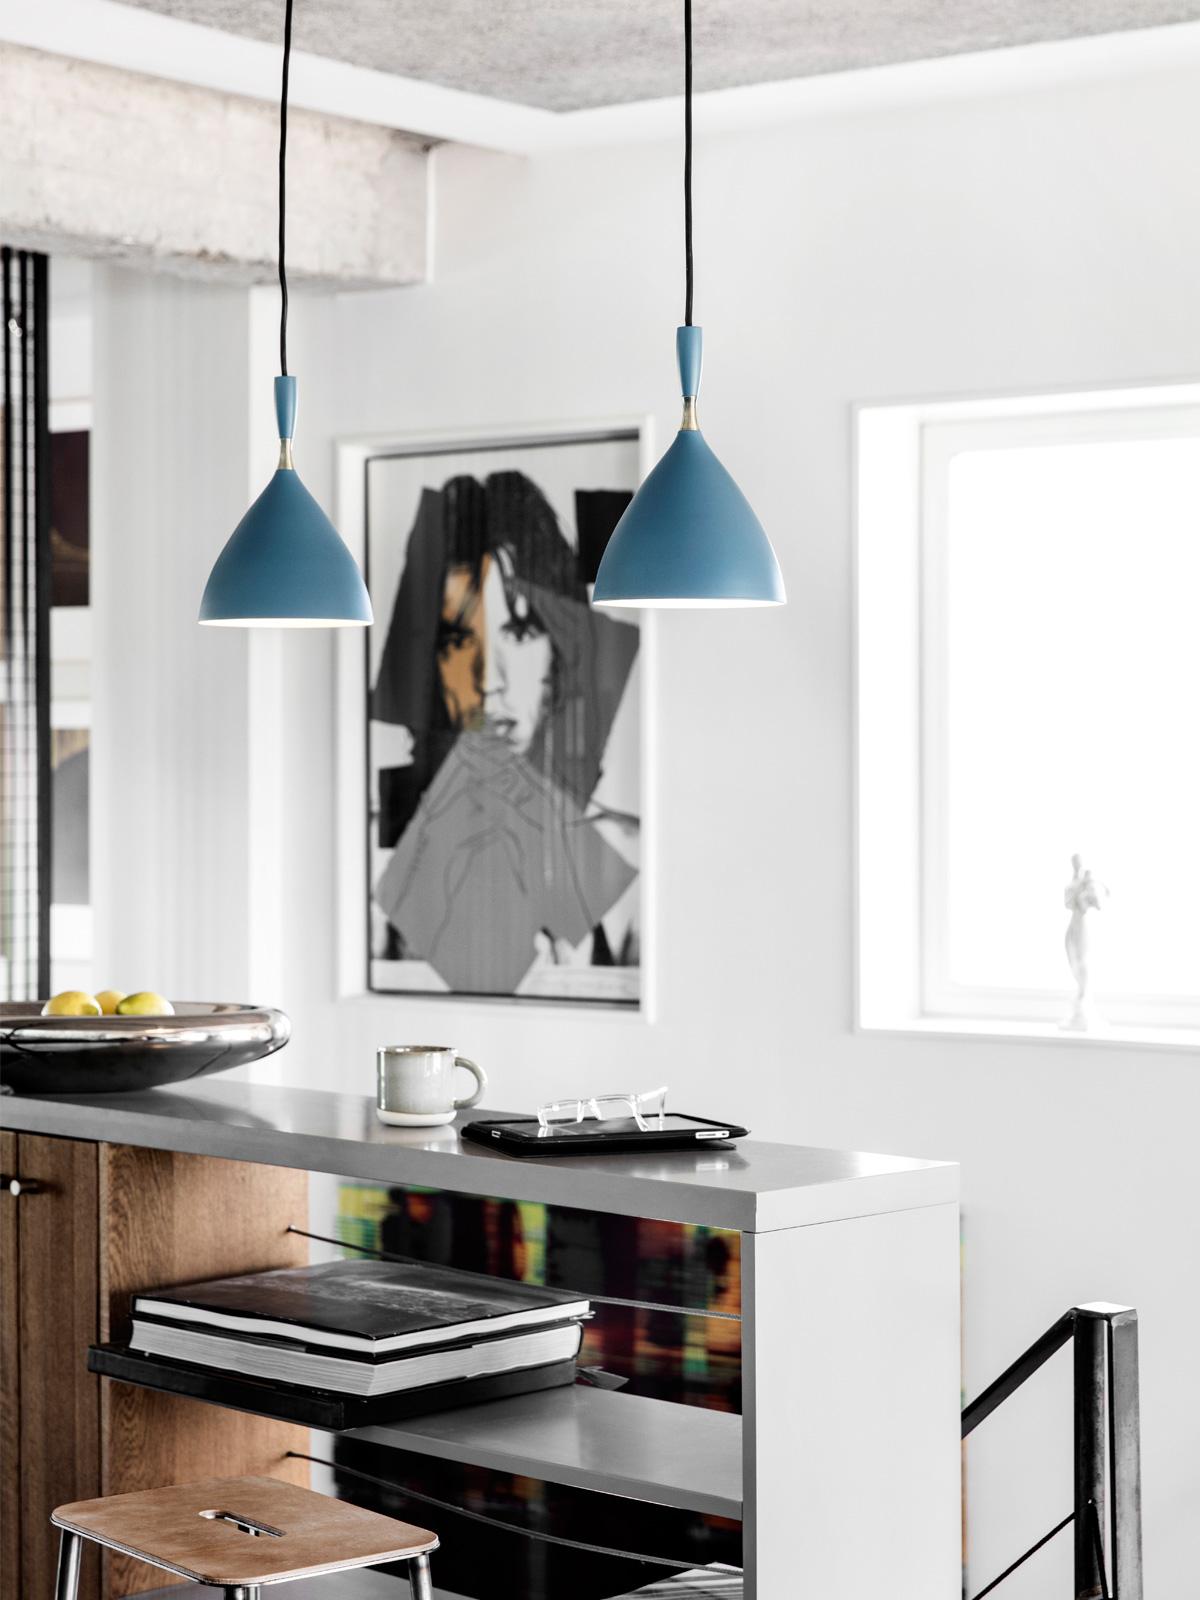 DesignOrt Blog Designer im Portrait: Birger Dahl Dokka